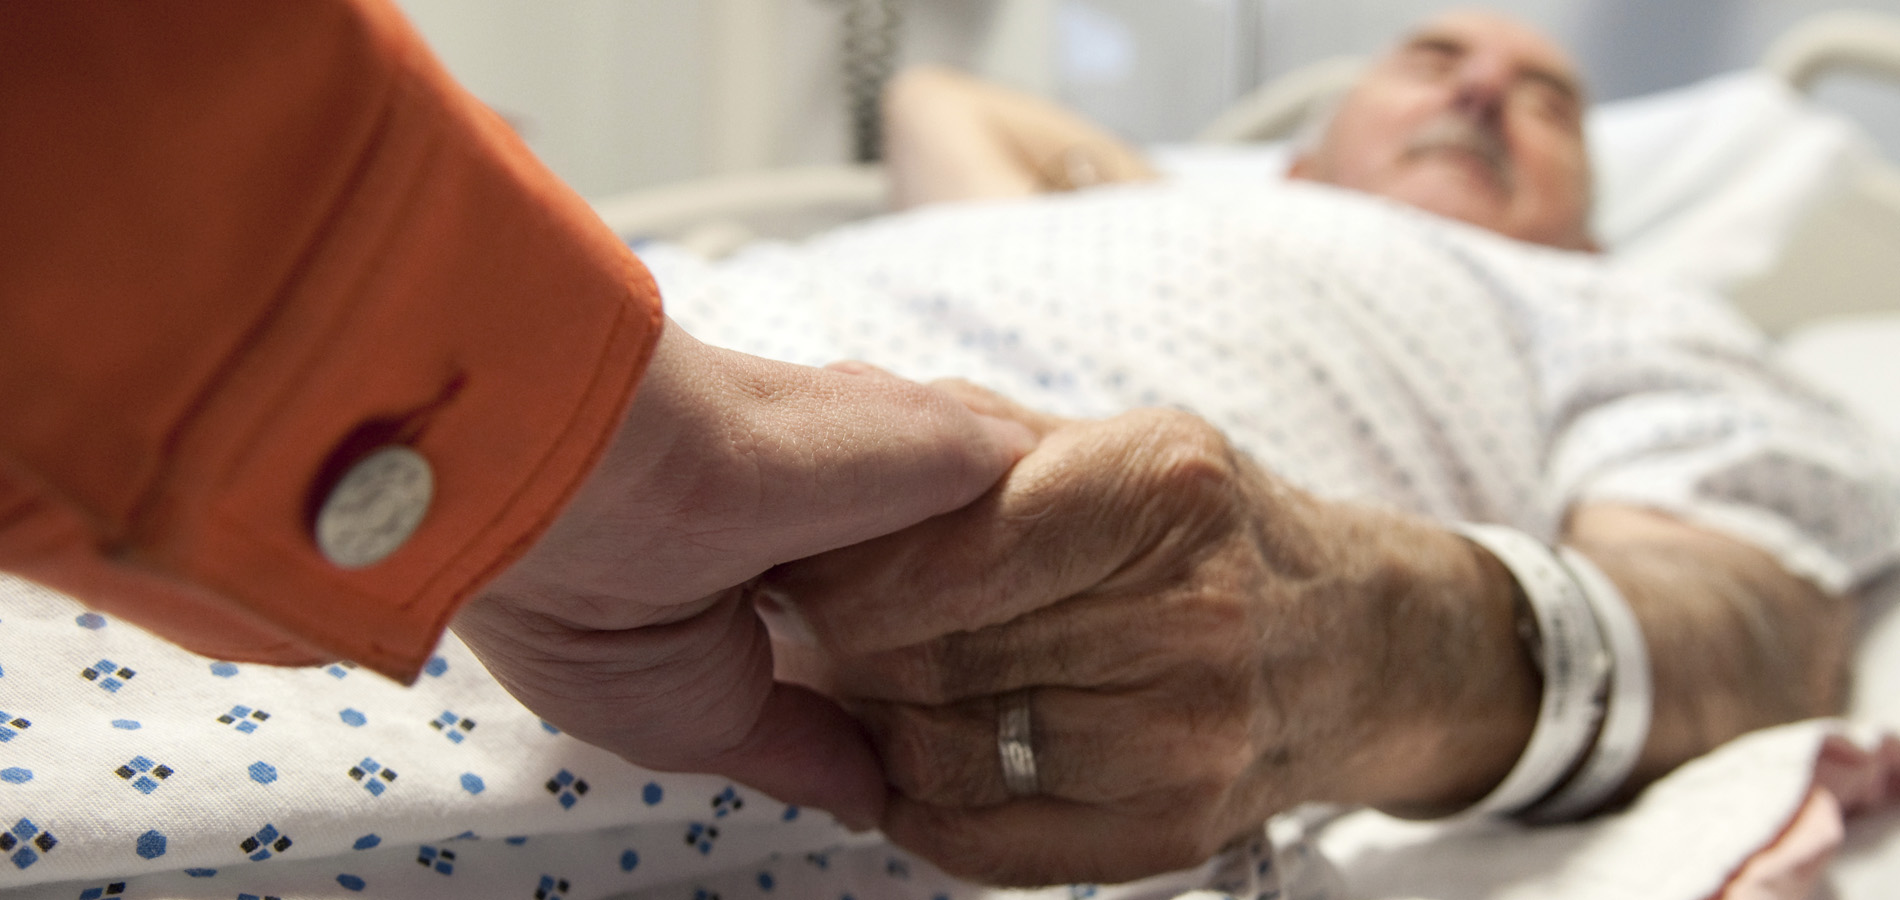 terminalvård palliativ vård